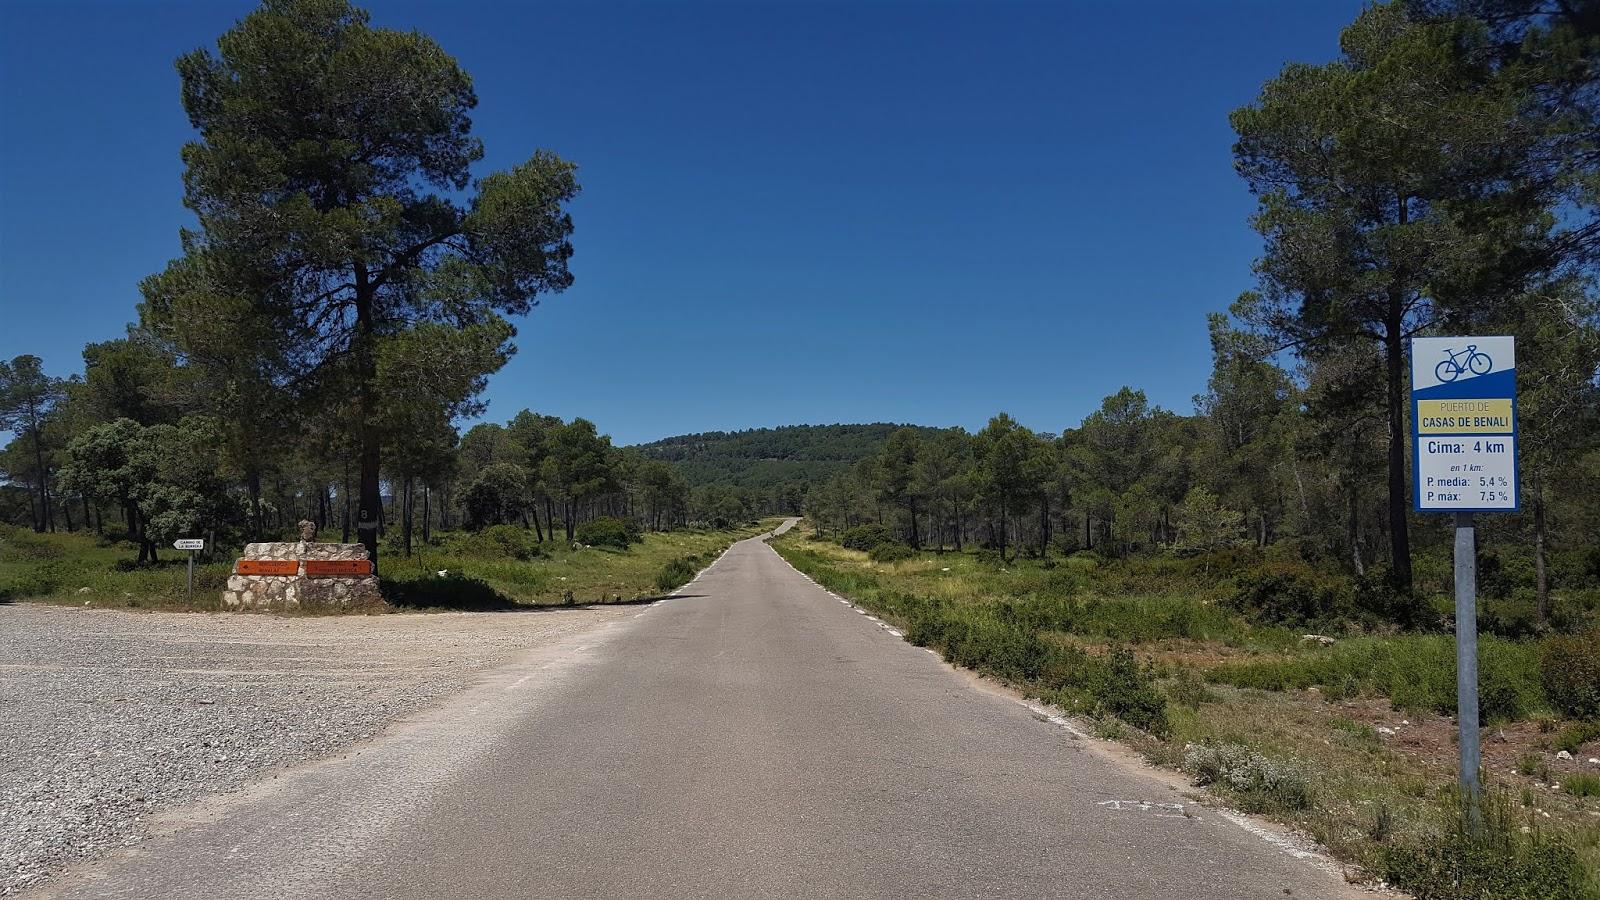 4 kilometre to go marker, Casas de Benalí, Spain